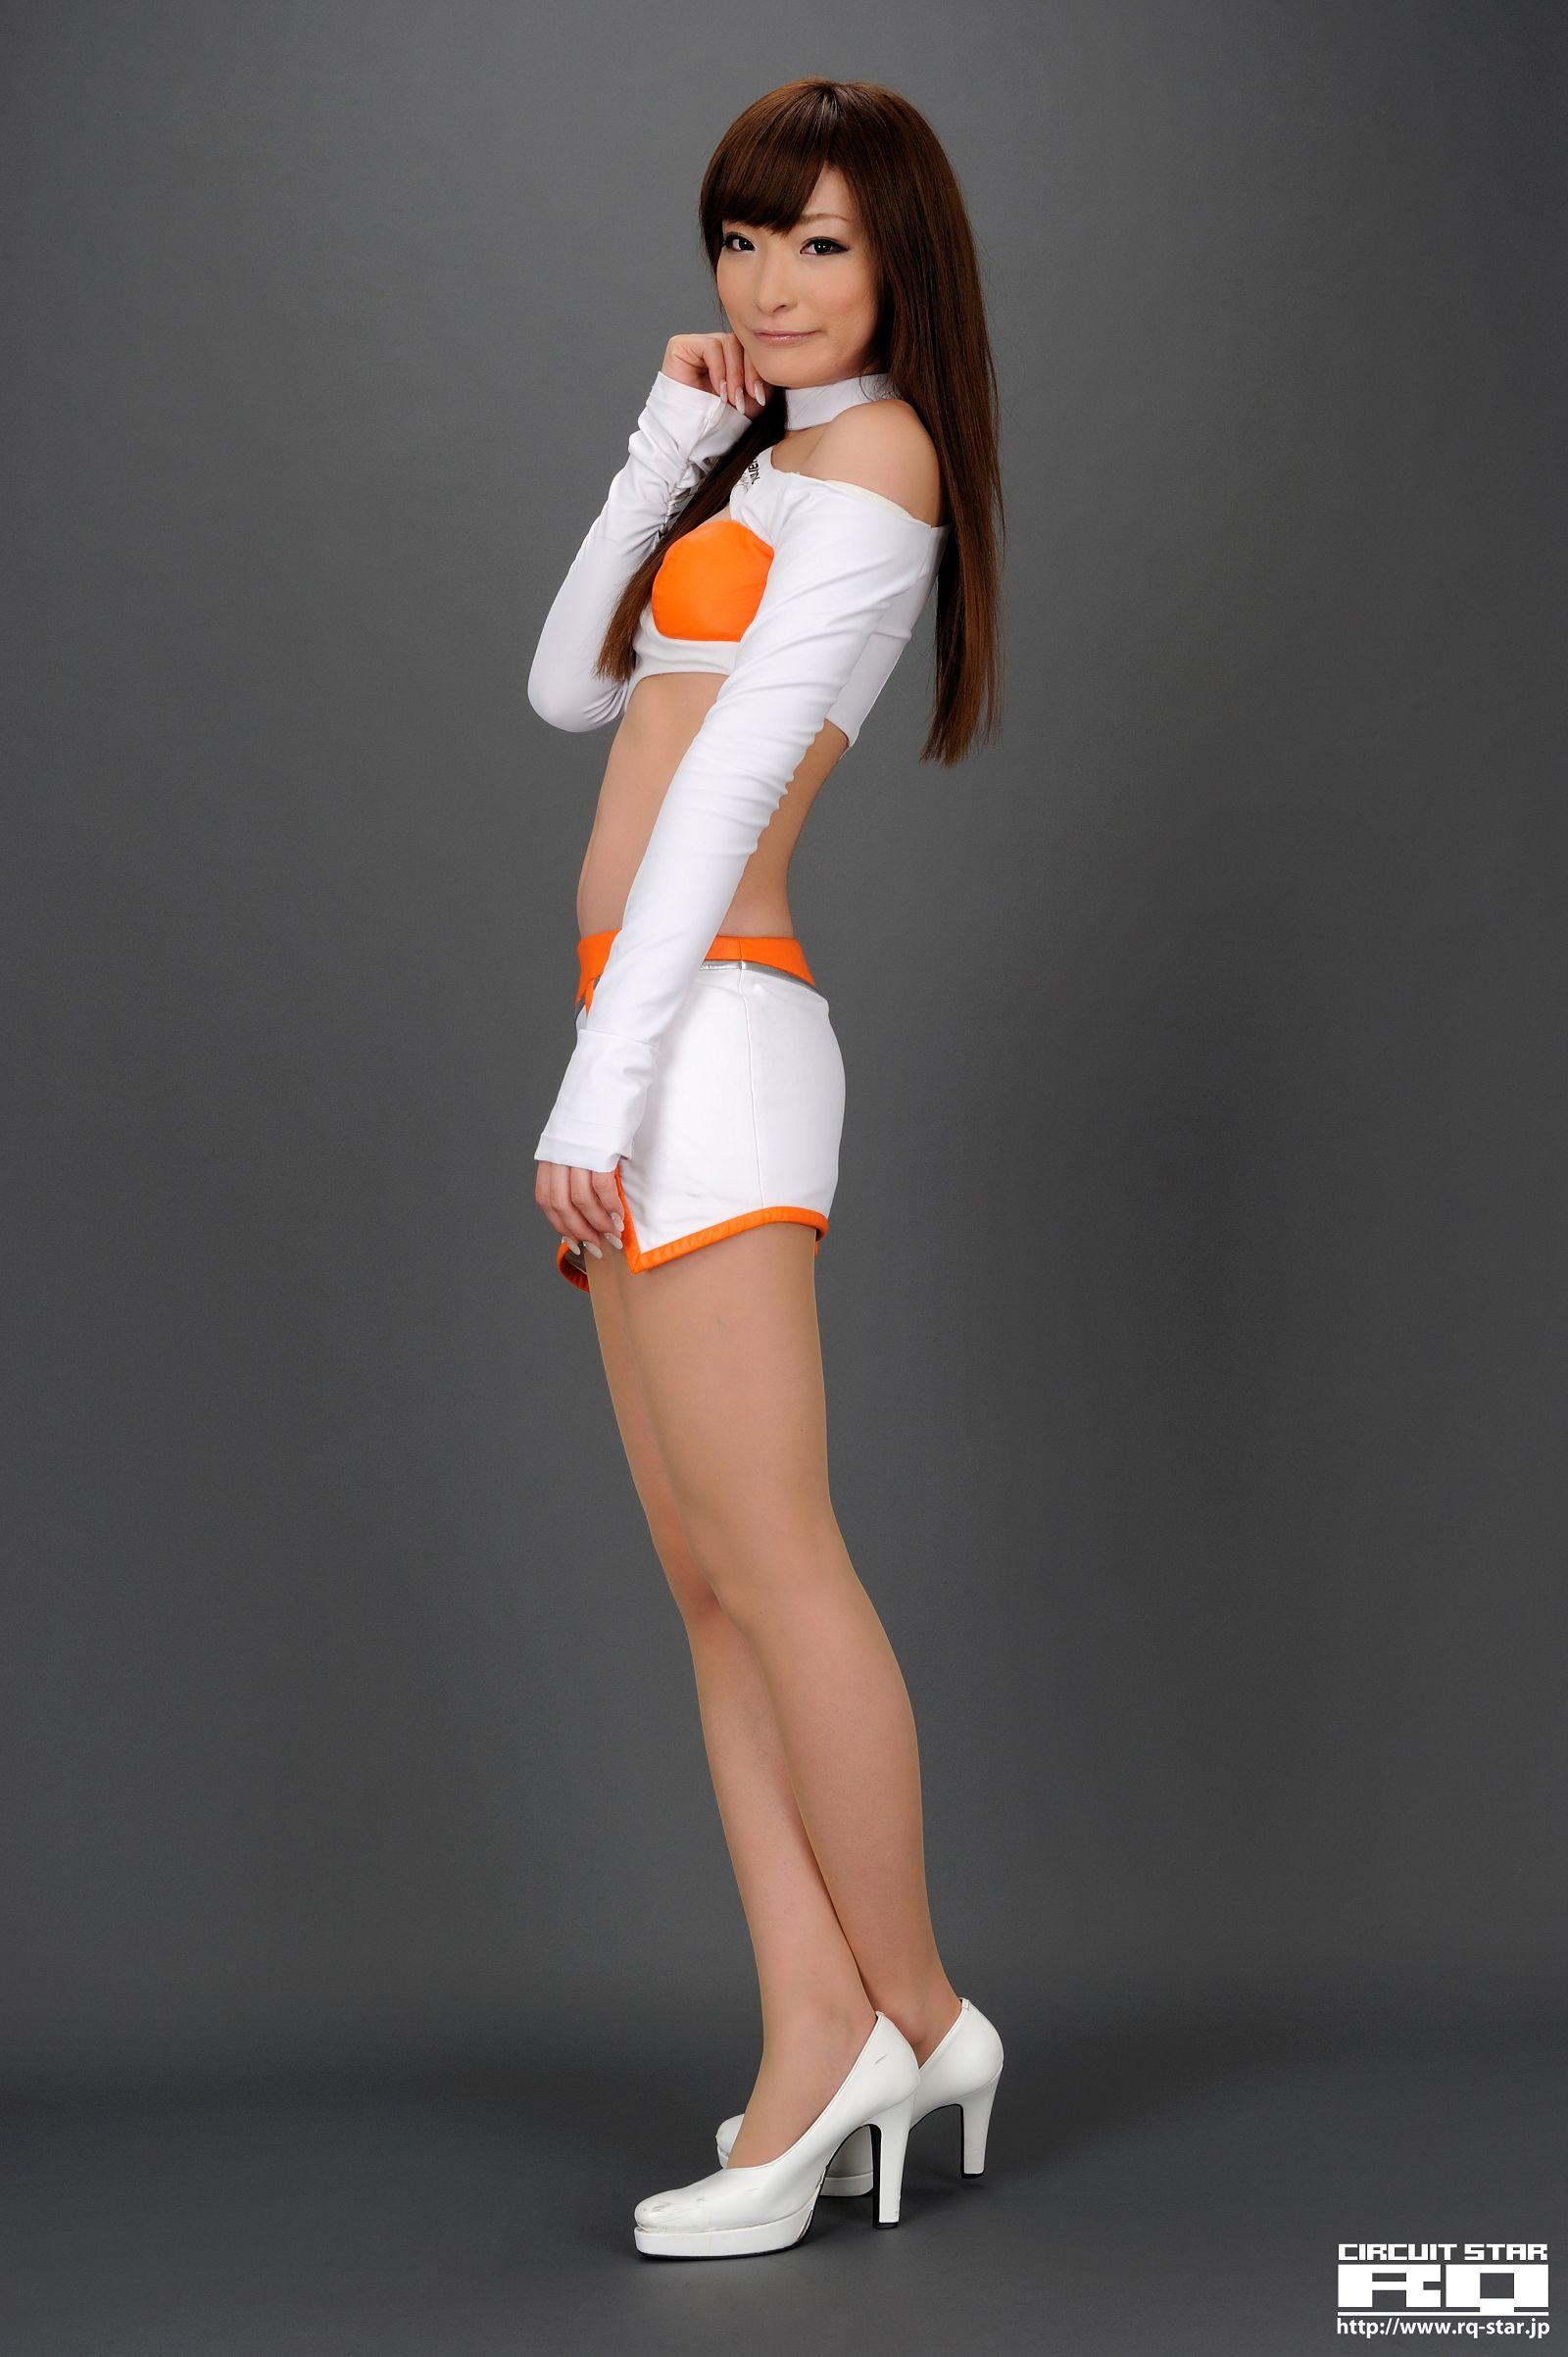 [RQ STAR美女] NO.0357 Yurie Asada 浅田ゆりえ Race Queen[93P] RQ STAR 第4张